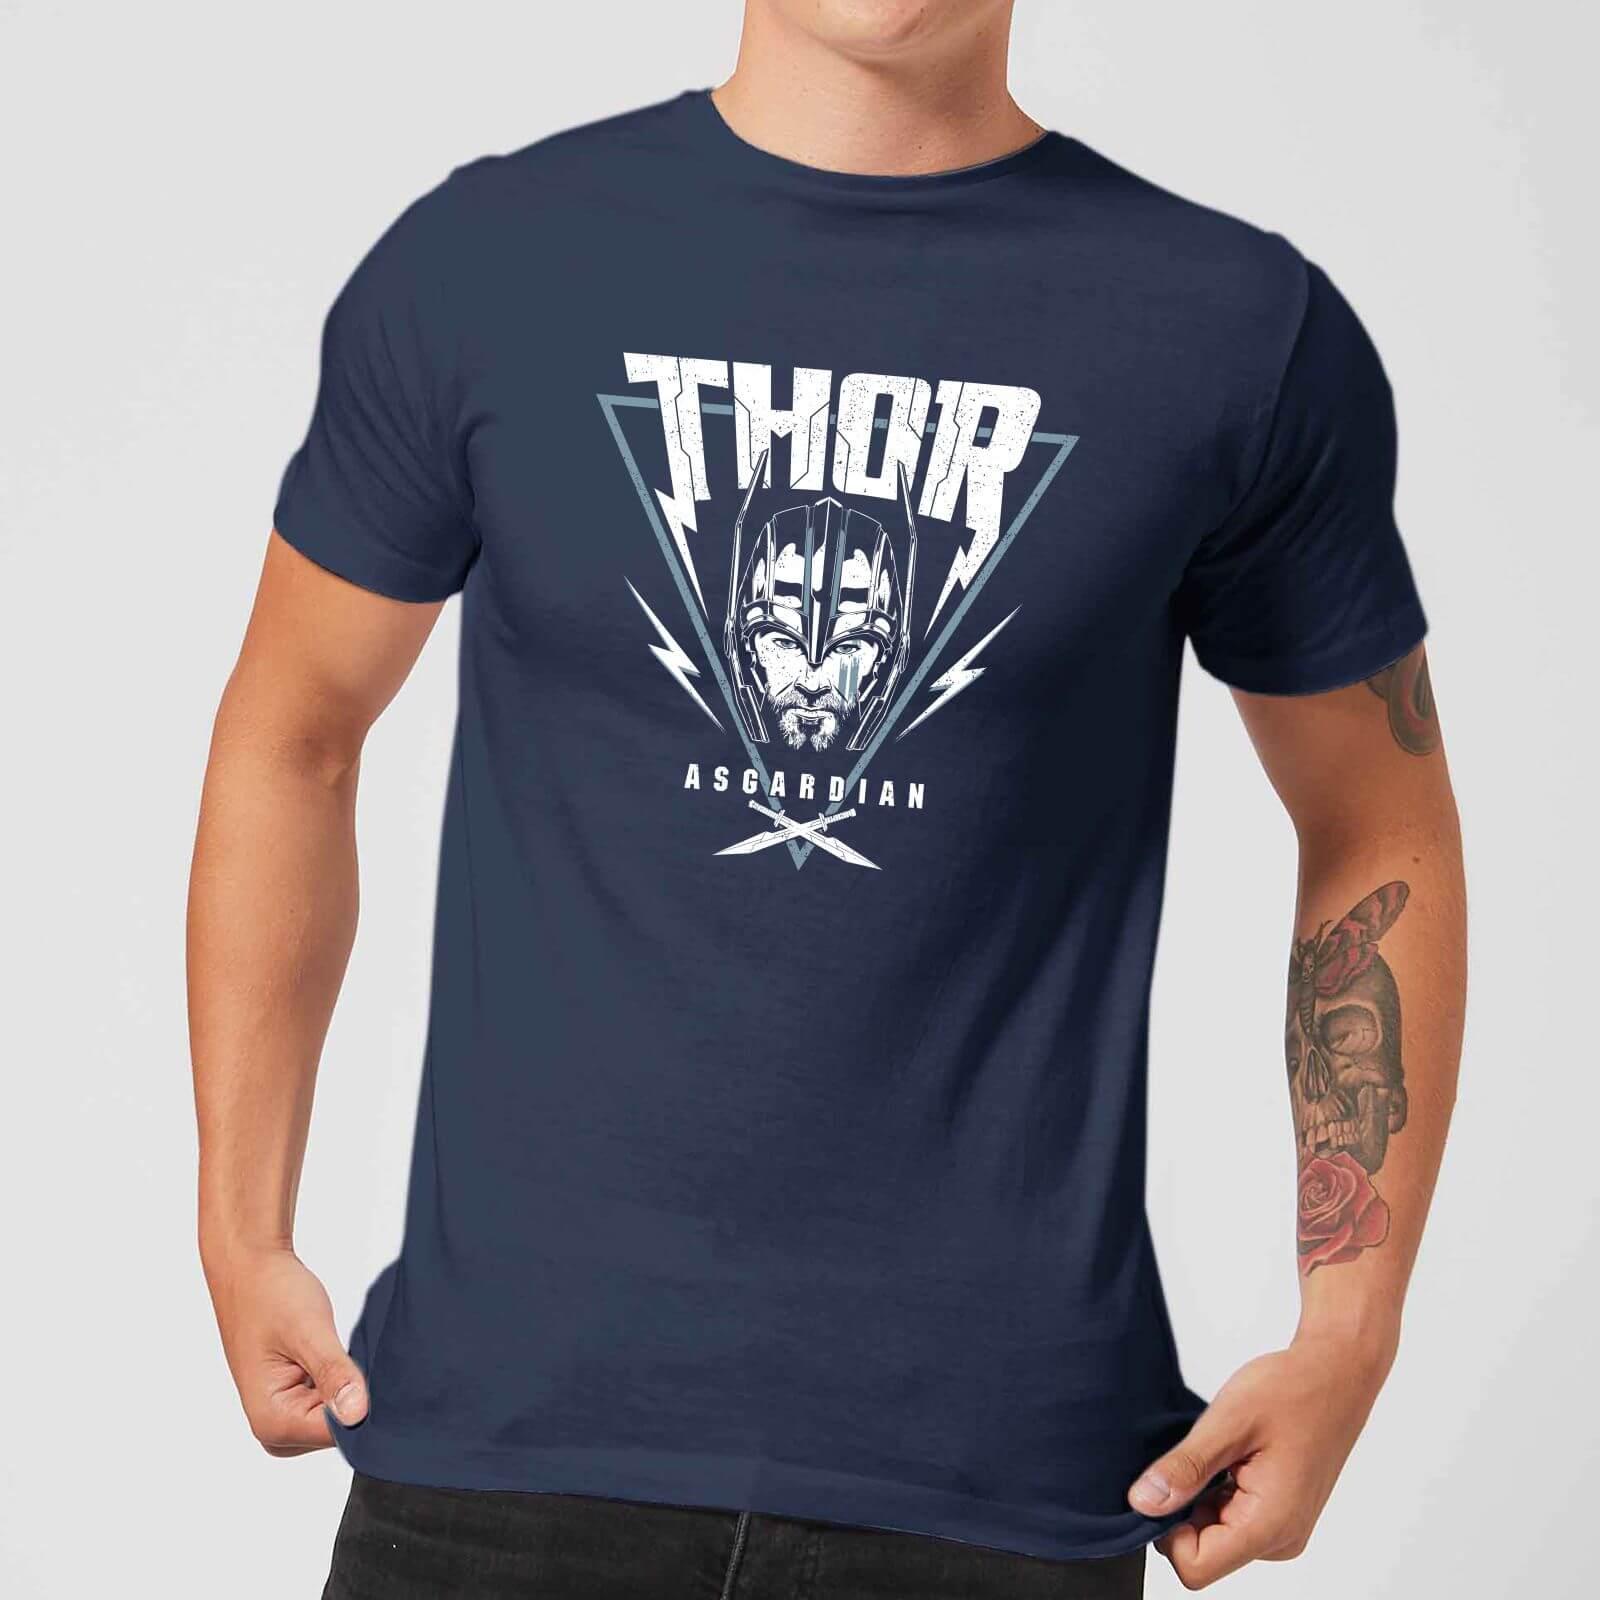 OfferteWeb.click 95-t-shirt-marvel-thor-ragnarok-asgardian-triangle-navy